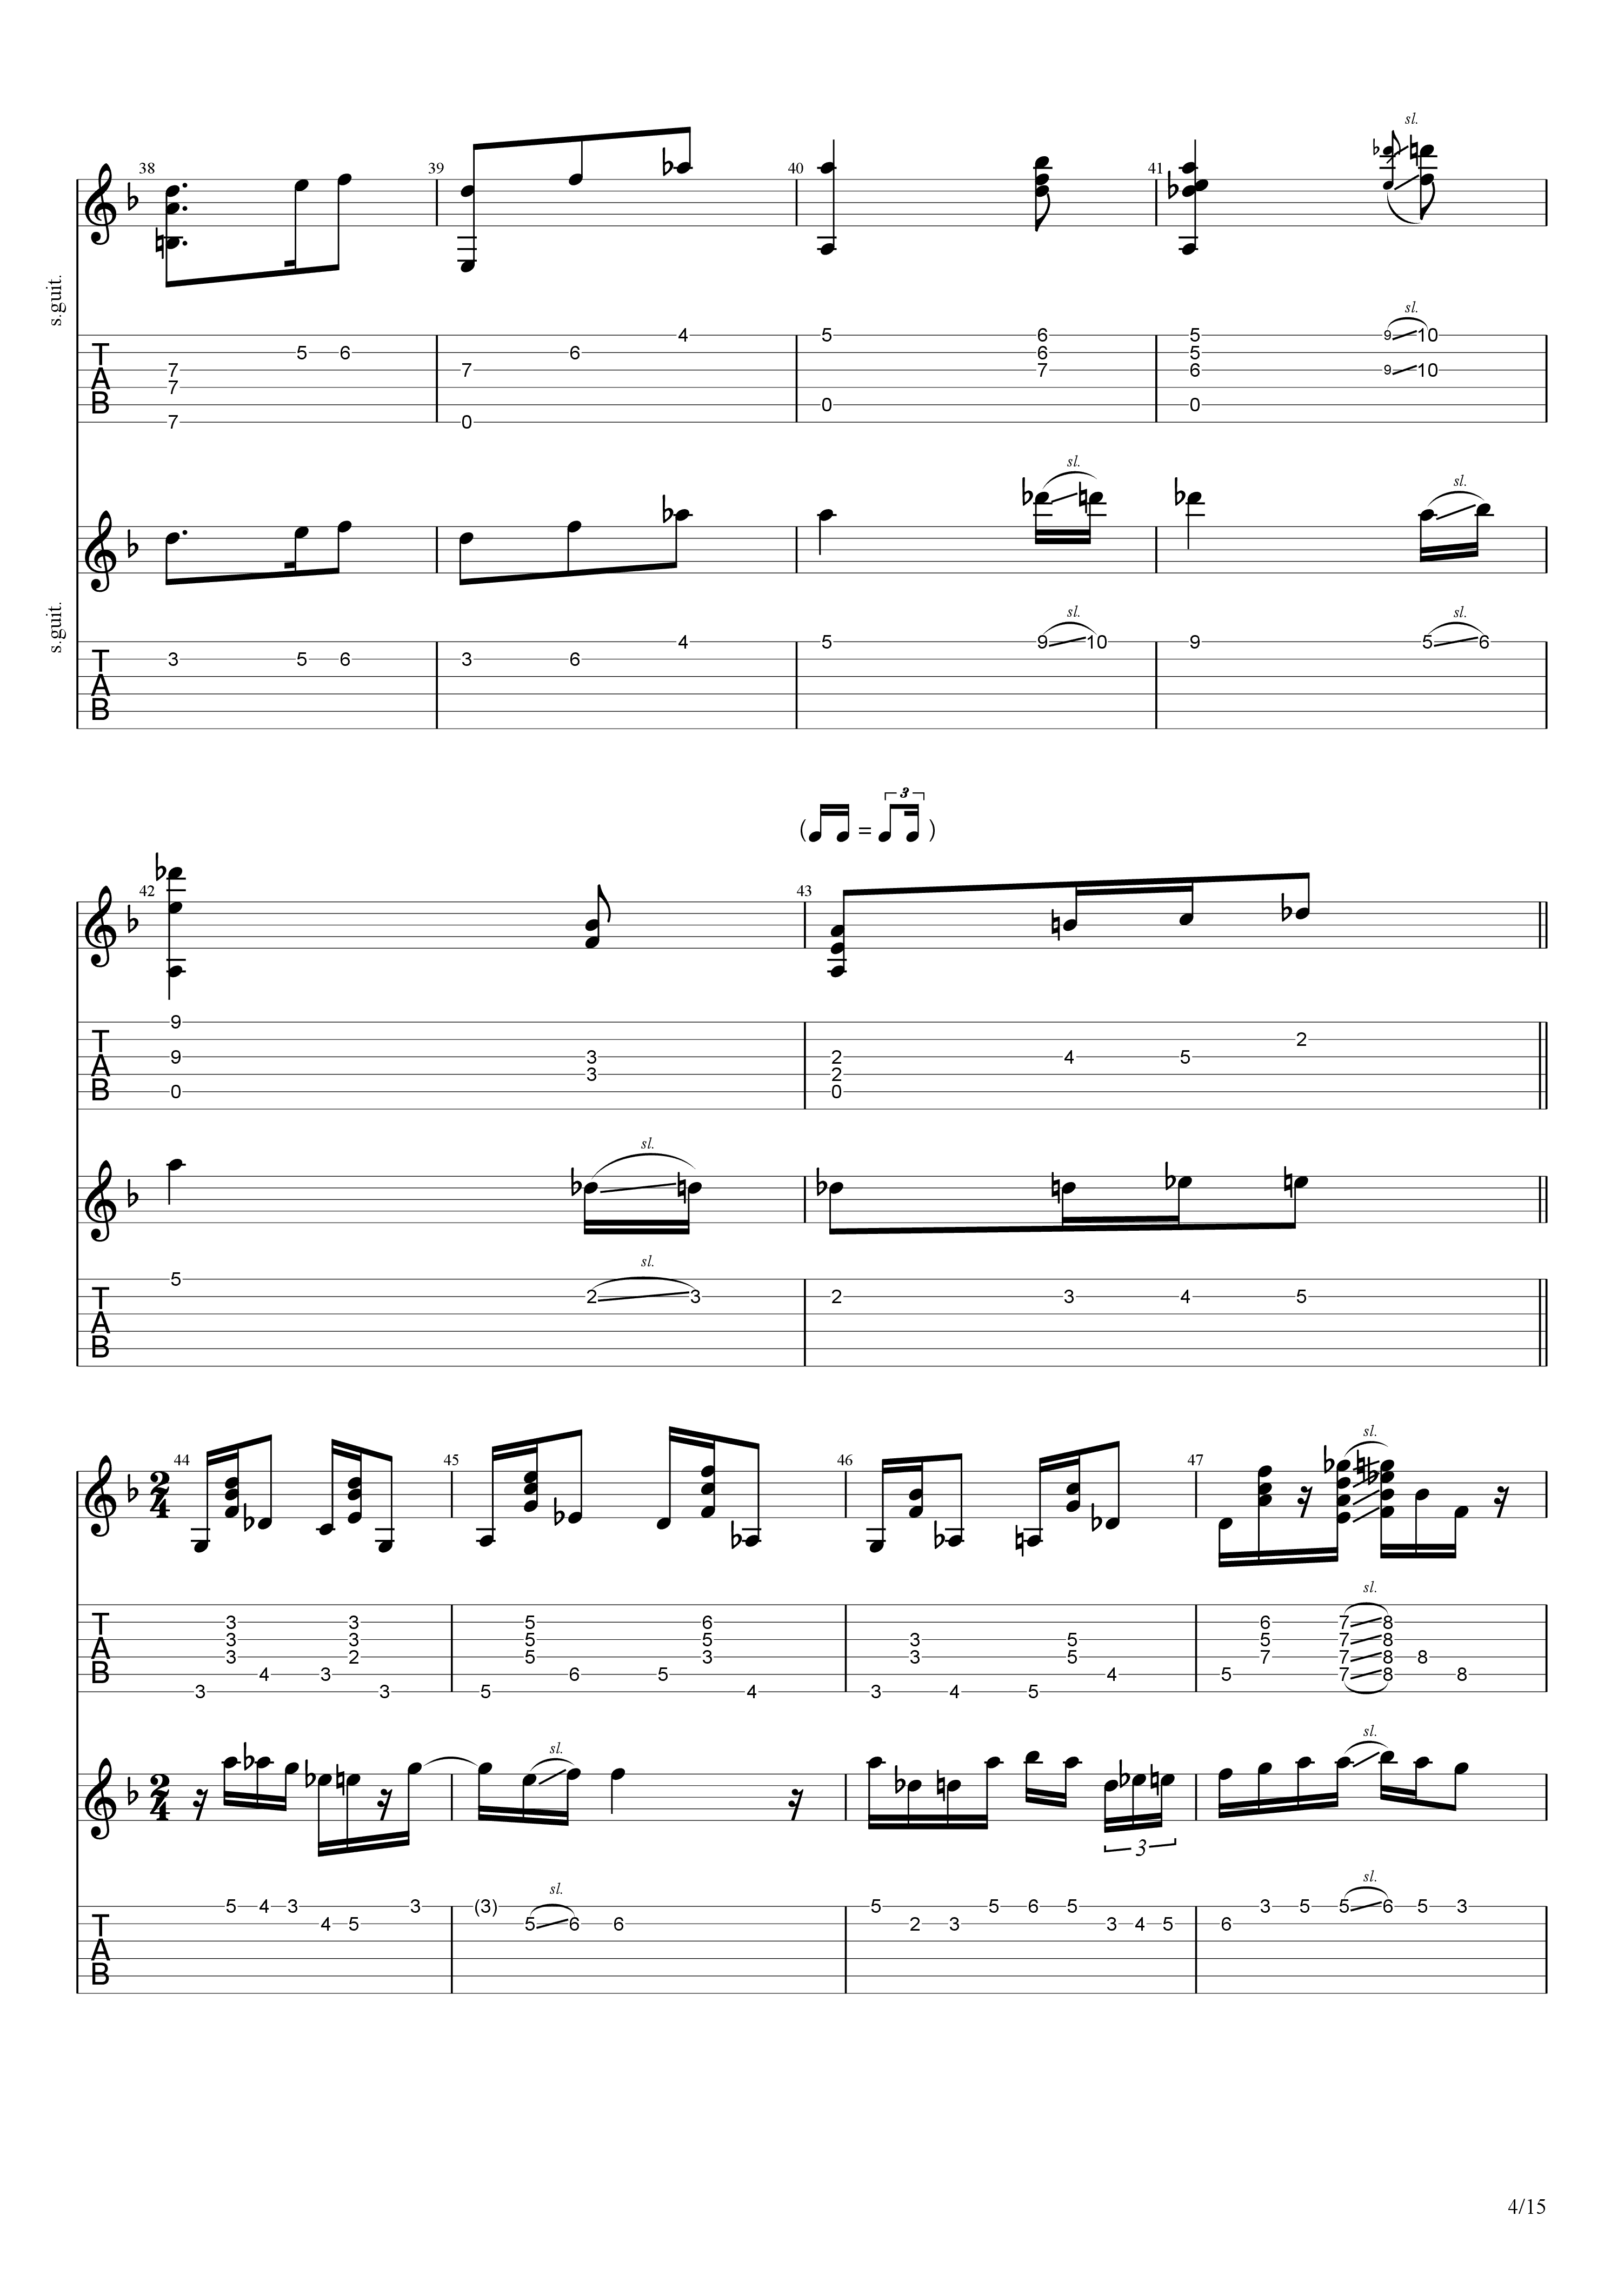 Labyrinth (松井佑贵&井草圣二)吉他谱4